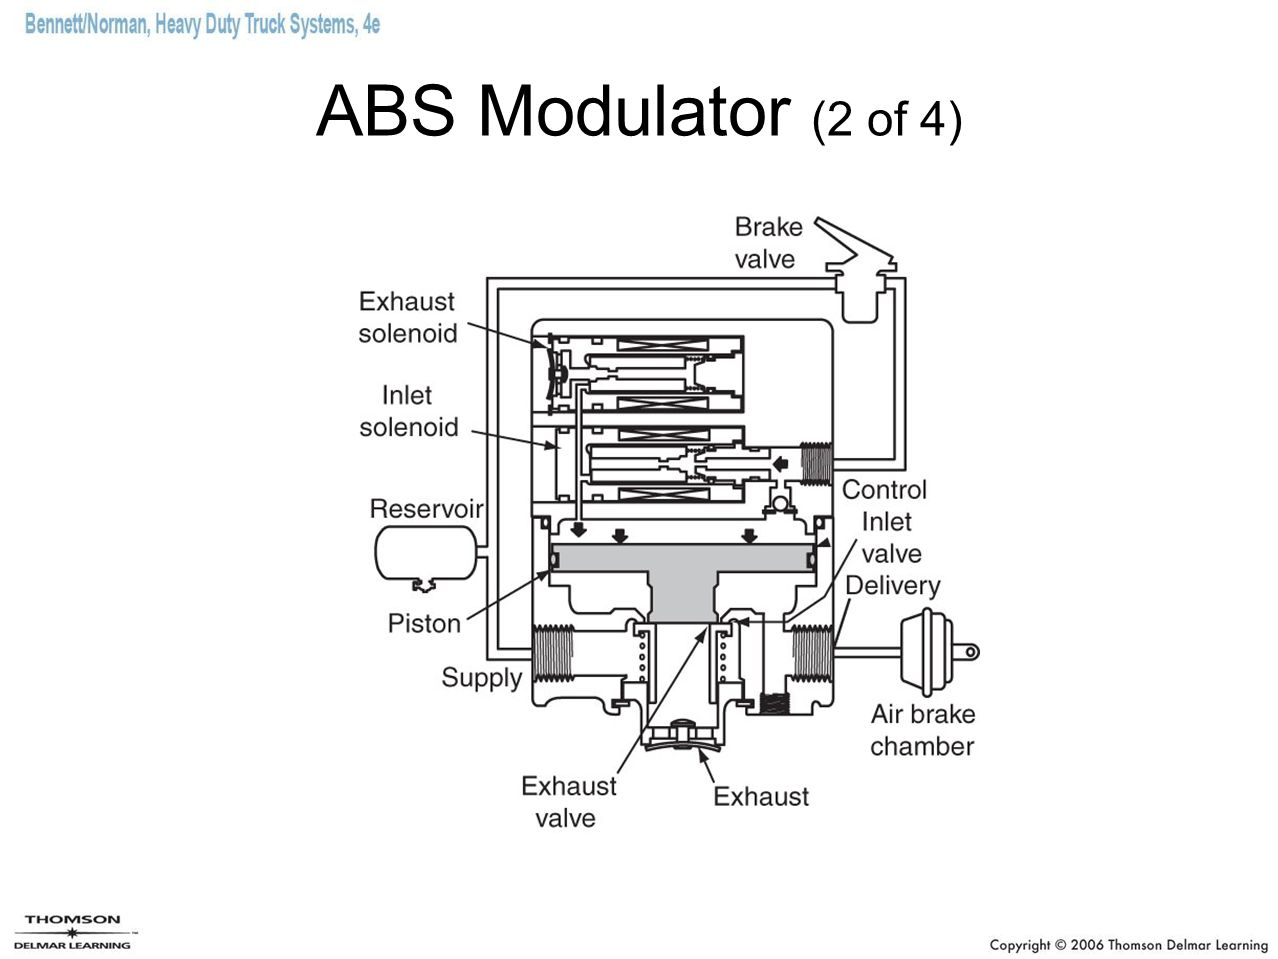 ABS Modulator (2 of 4)